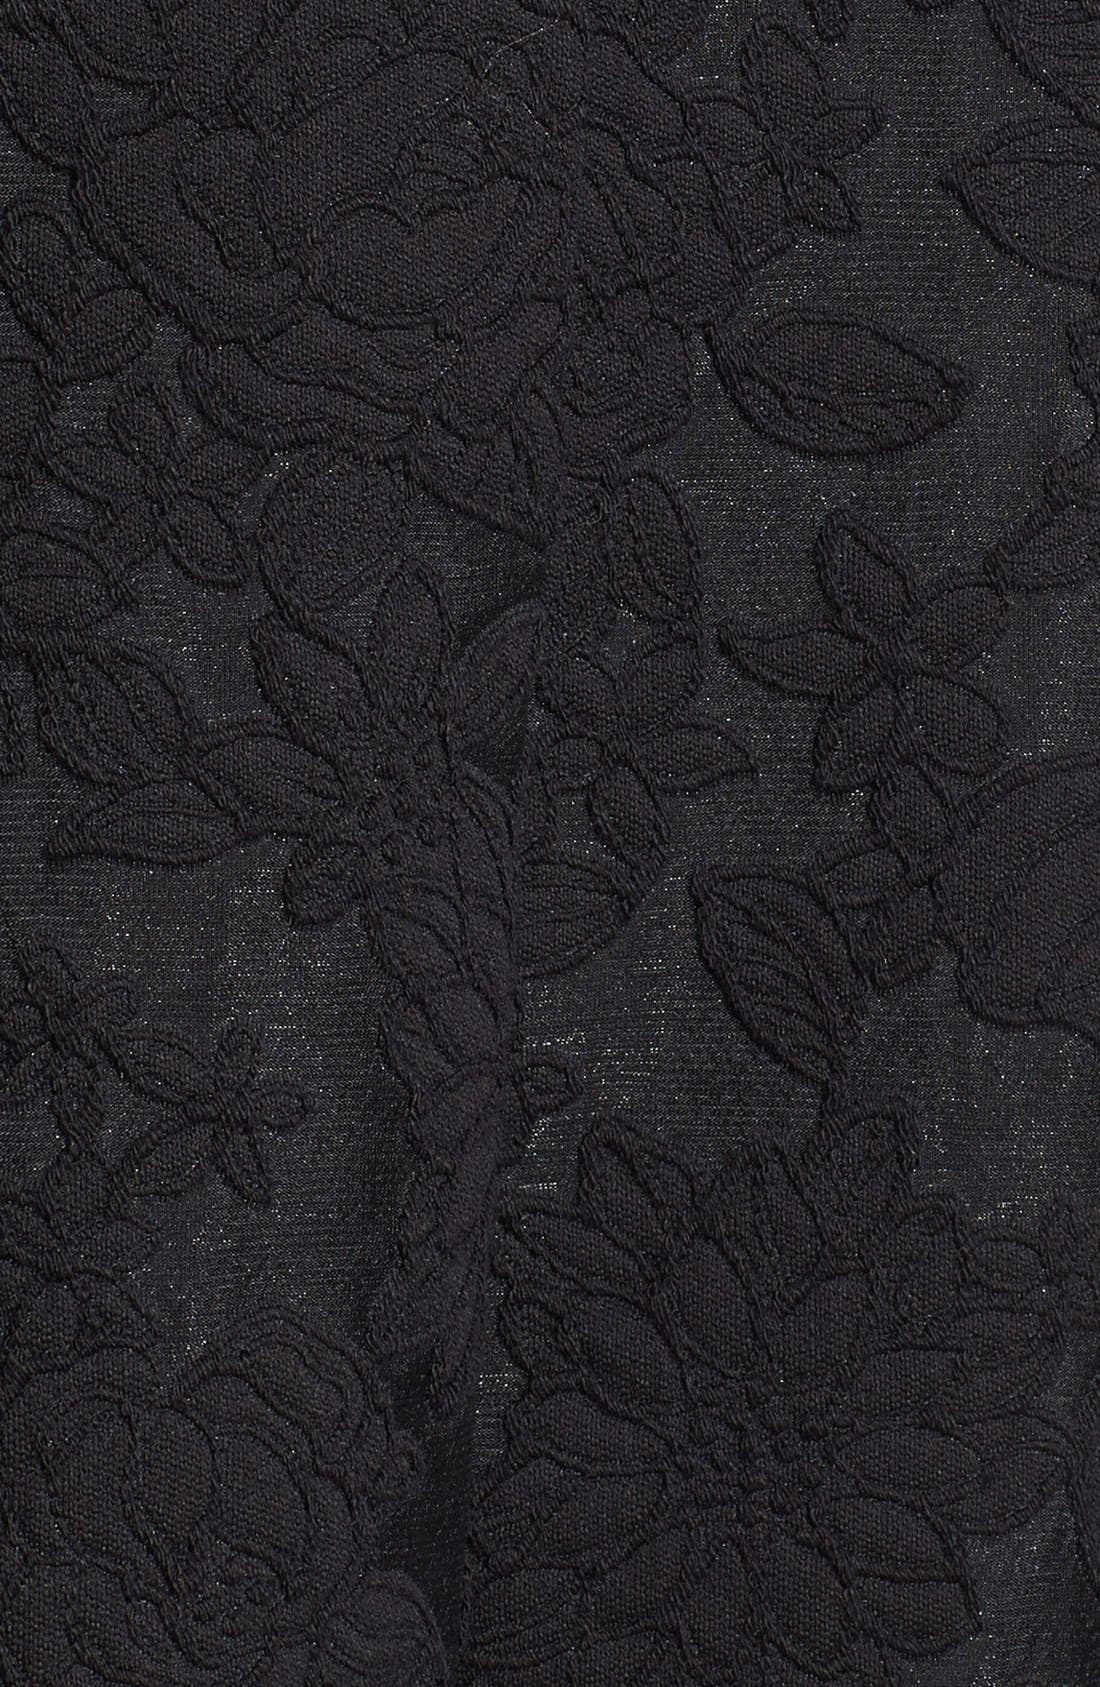 MICHAEL KORS, Floral Embroidered Pleated Midi Skirt, Alternate thumbnail 2, color, 001